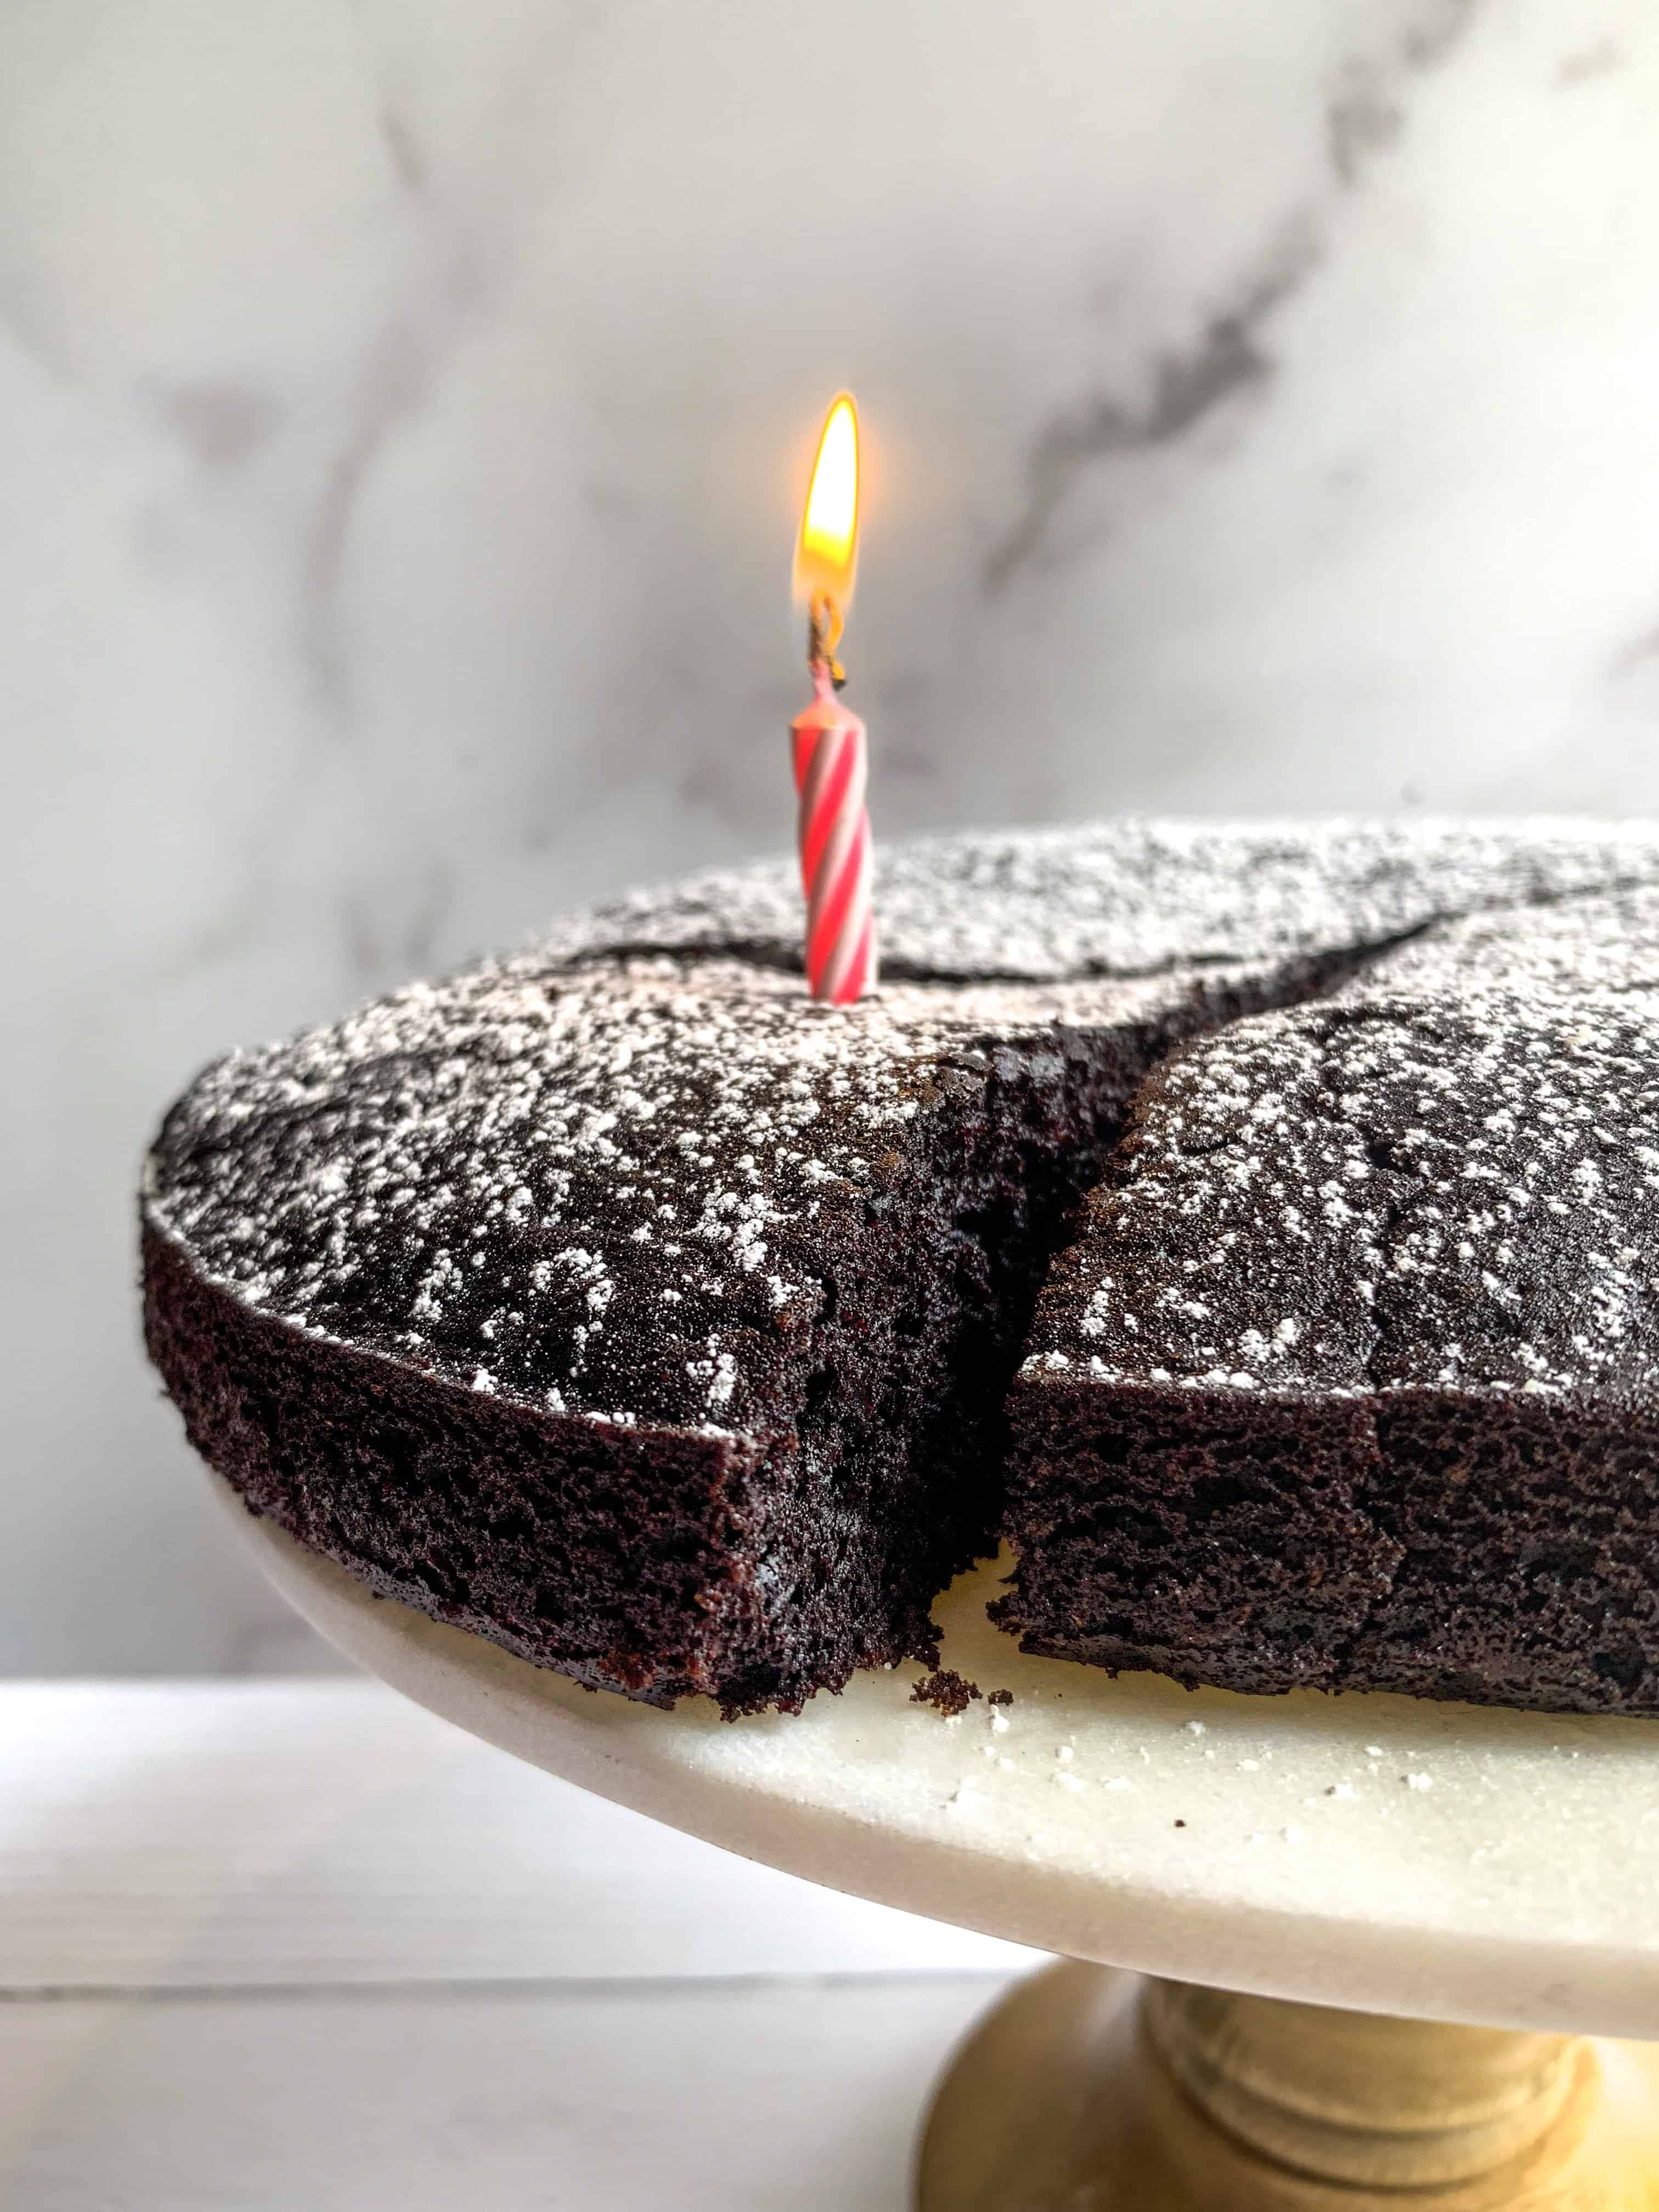 dairy free chocolate cake on stand